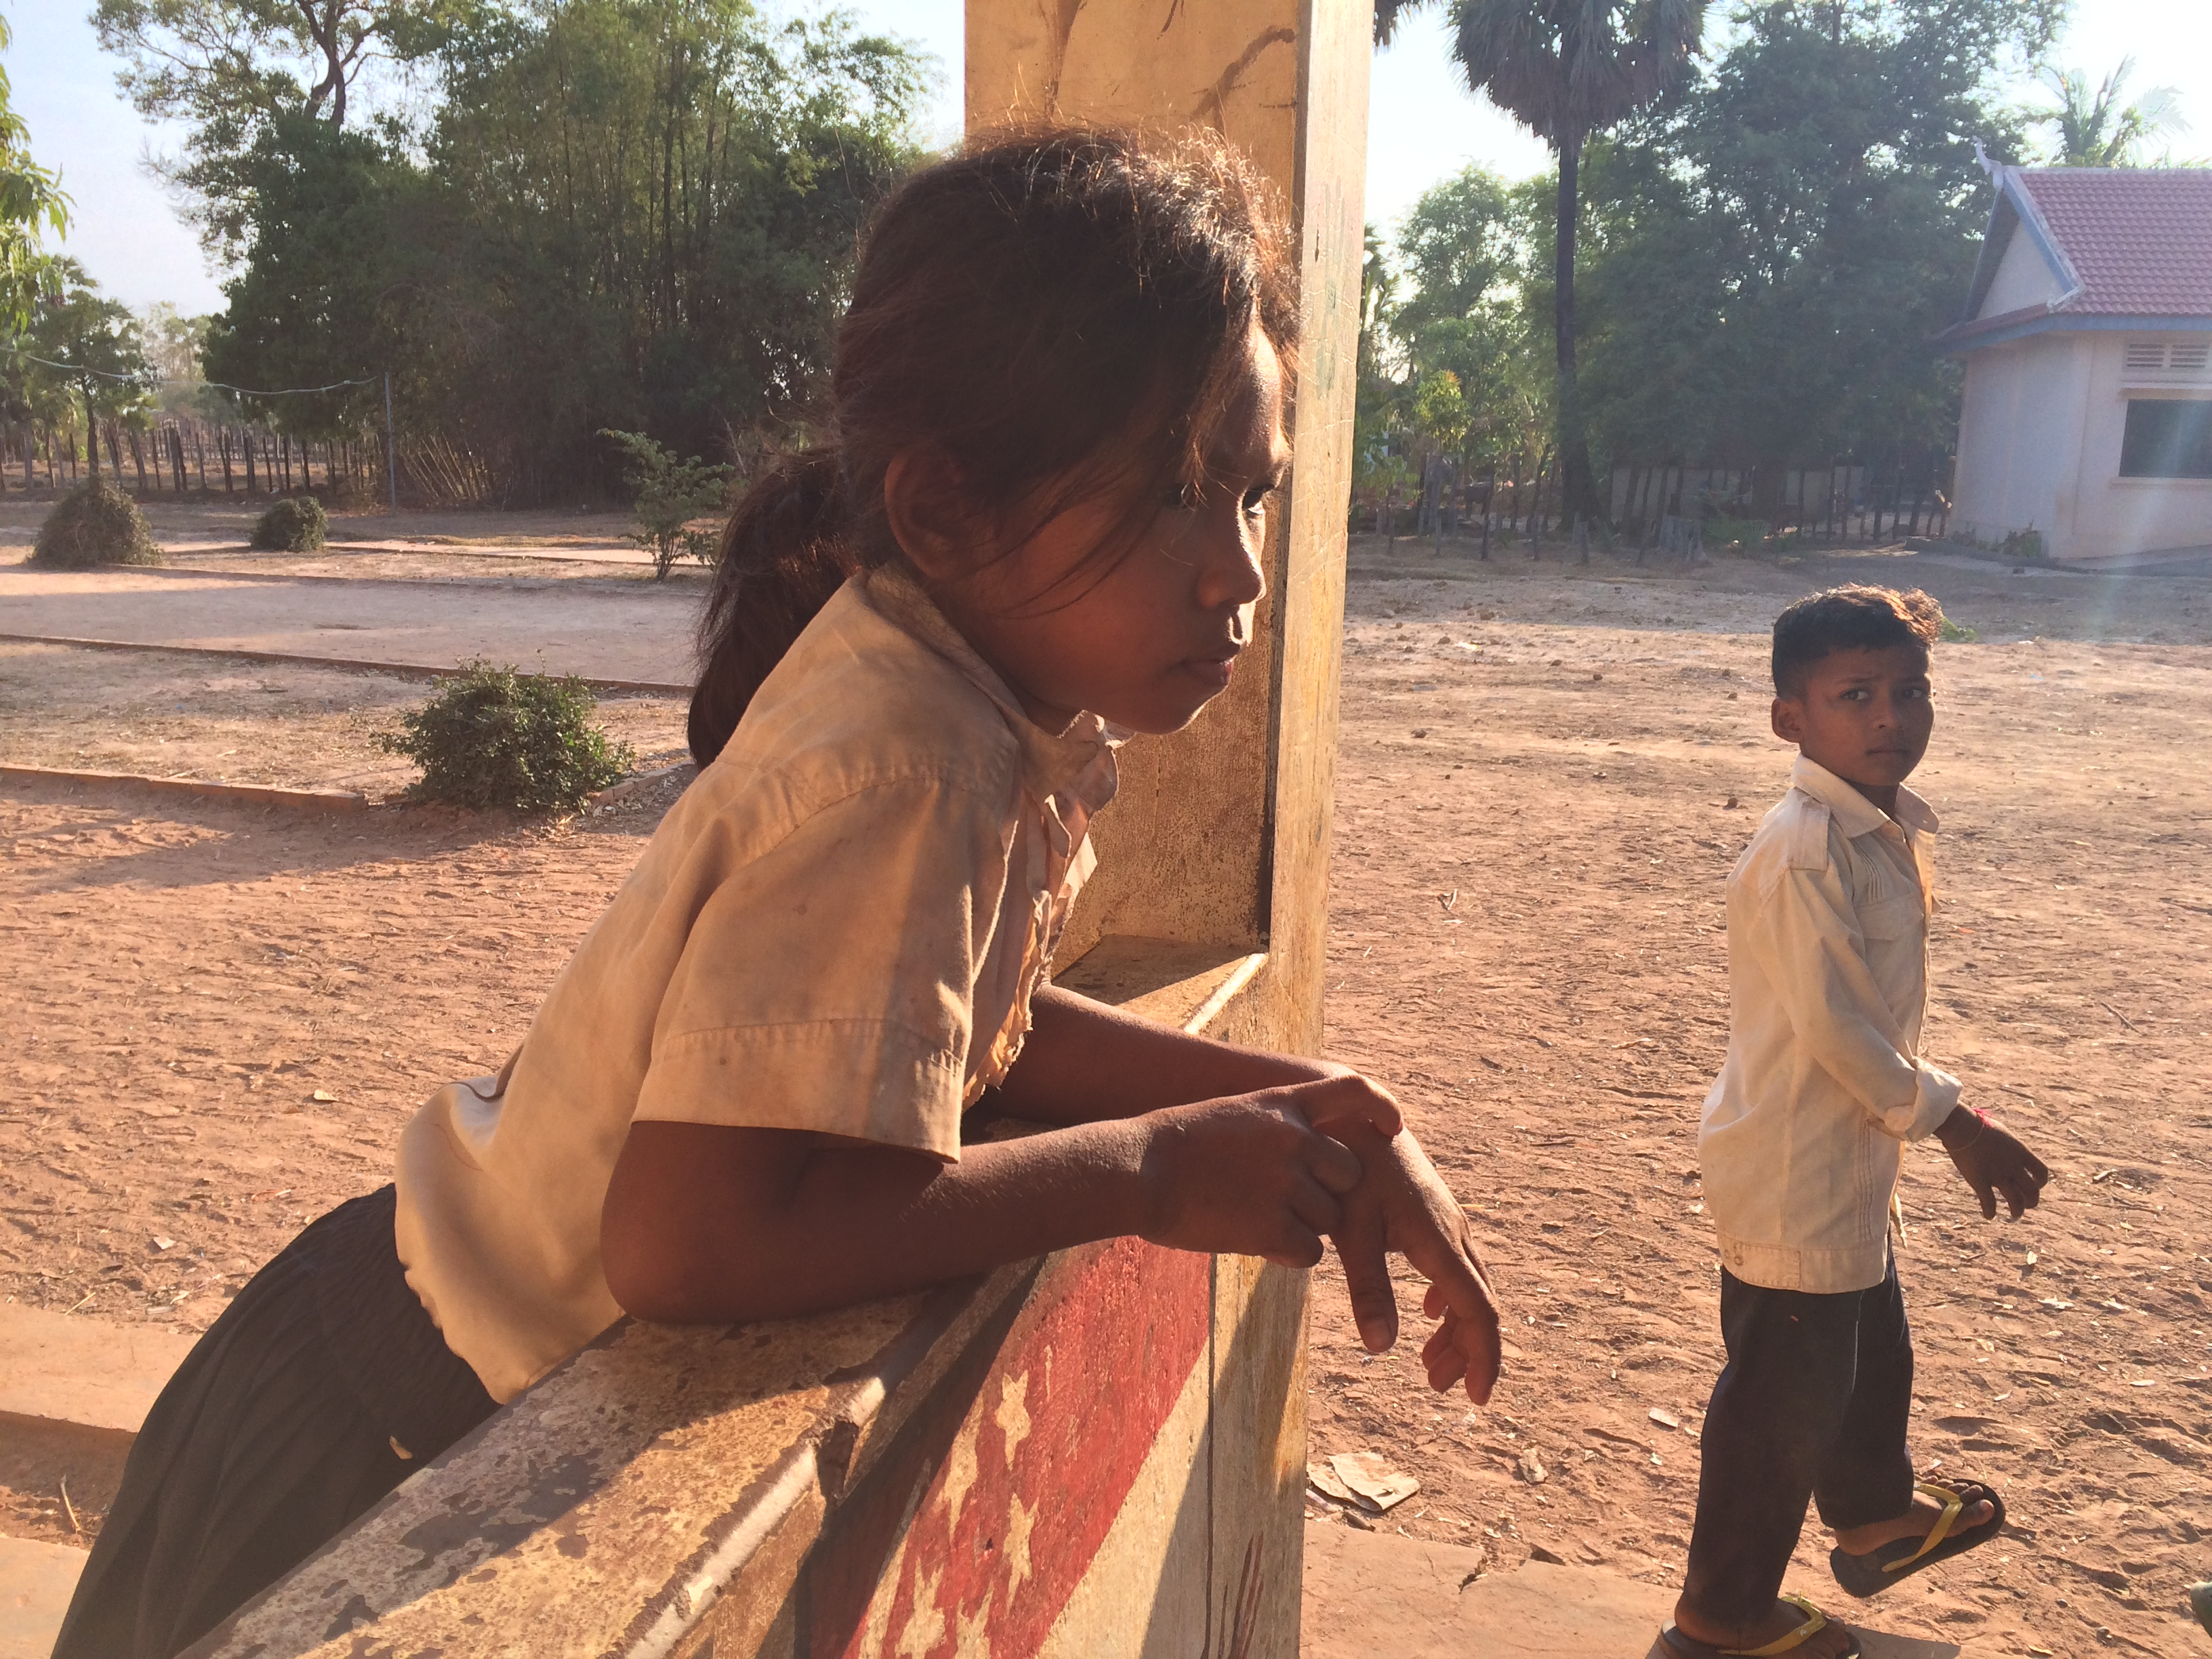 Siem Reap, Cambodia 2015.